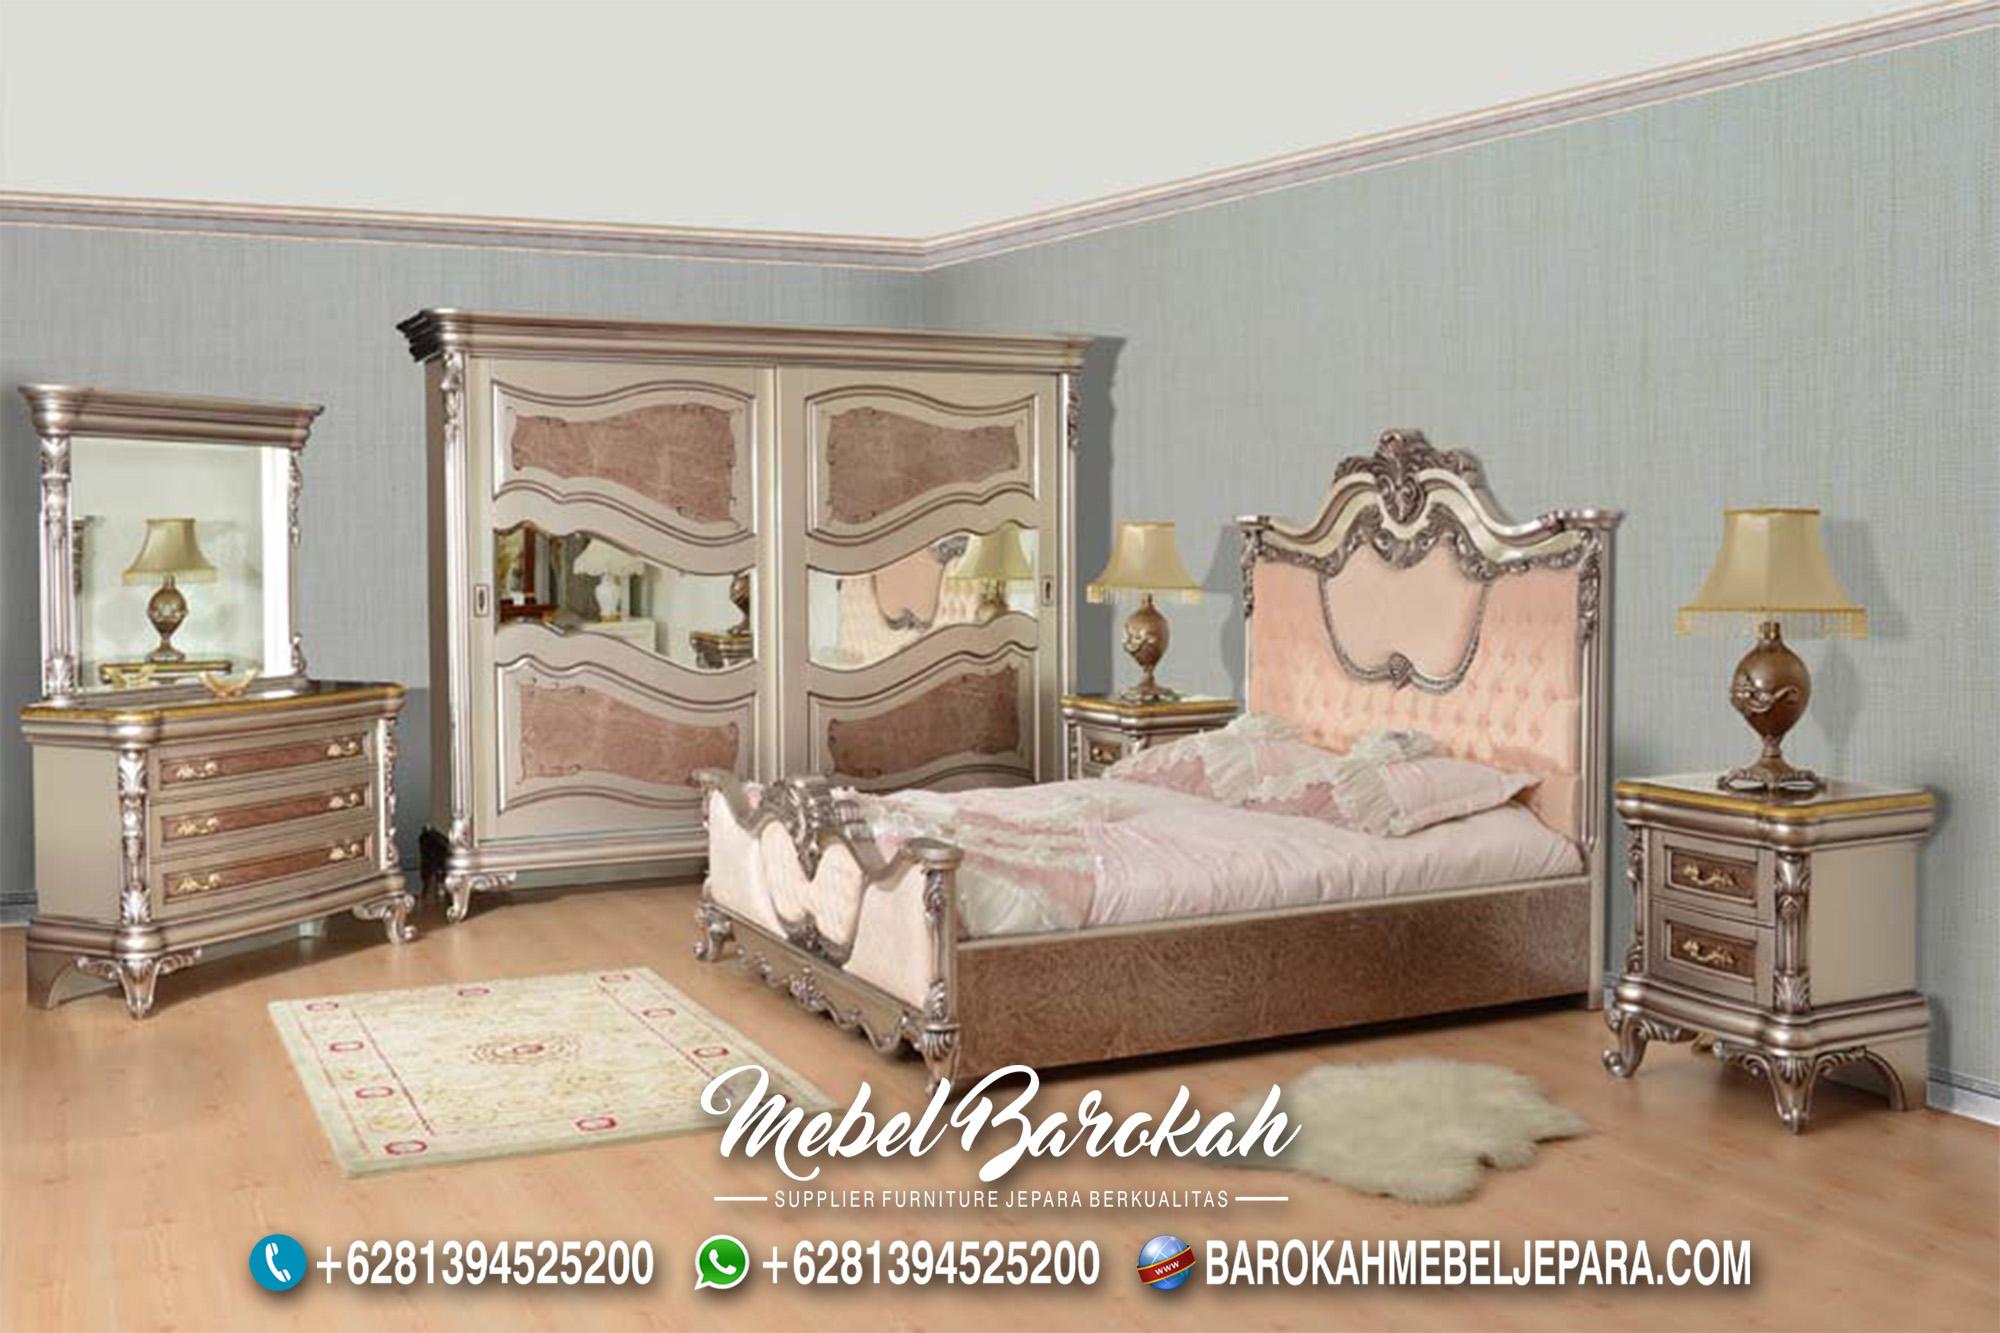 Kamar Tidur Klasik Ukir Warna Pink Soft MB-648